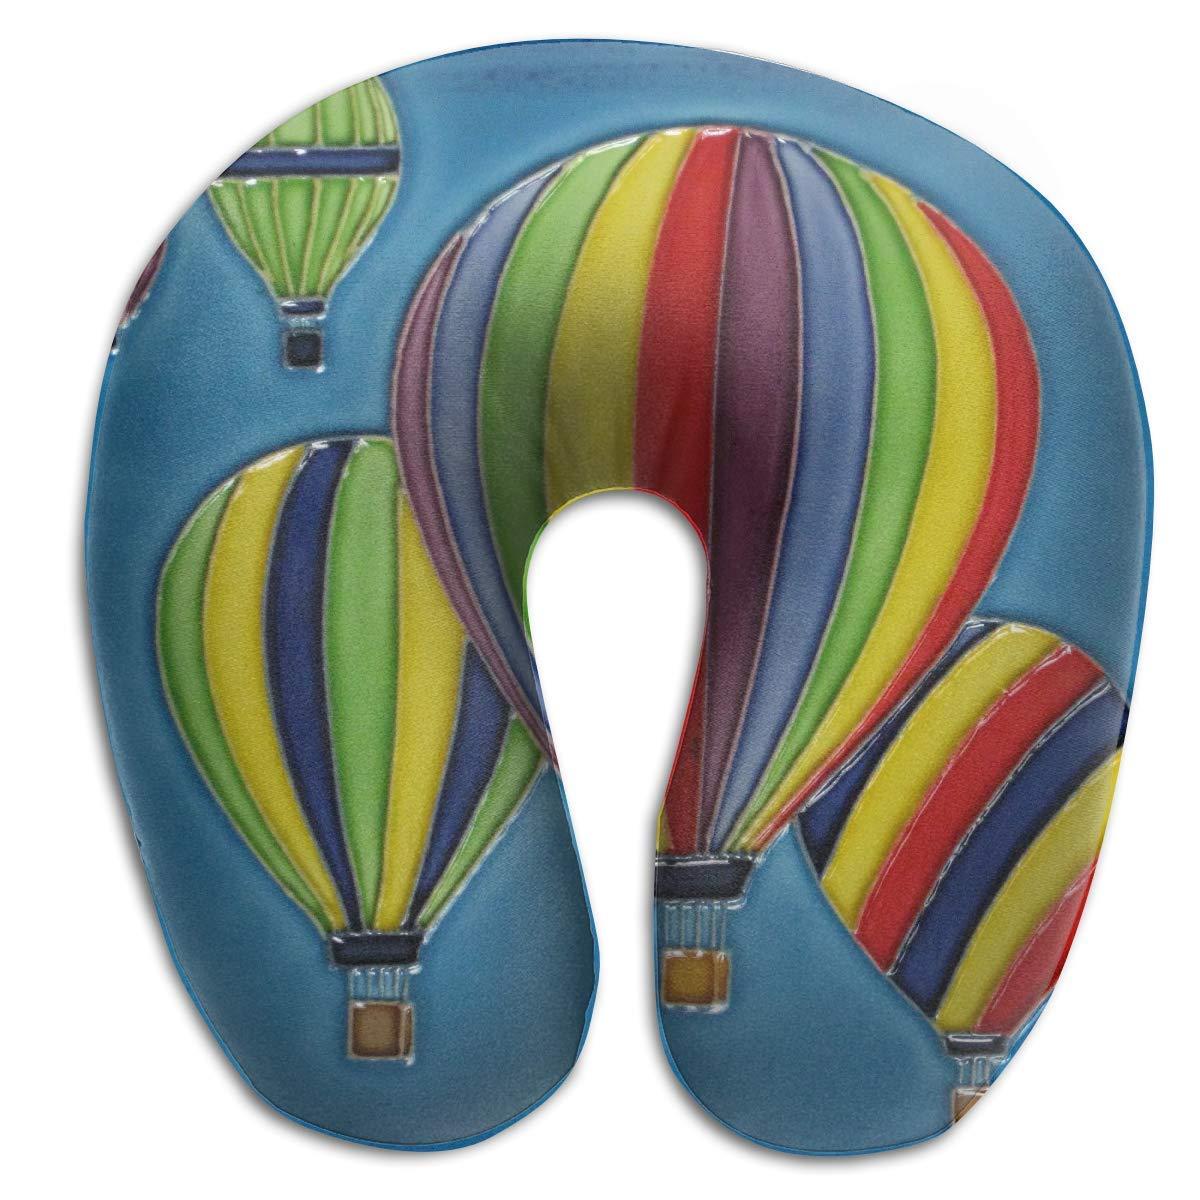 rongxincailiaoke Nackenhörnchen Beautiful Balloon Oil Paintings U Shaped Travel Neck Pillow Portable Head Neck Rest Memory Foam Pillows for Office Napping, Airplanes, Car Decor Seitenschläferkissen